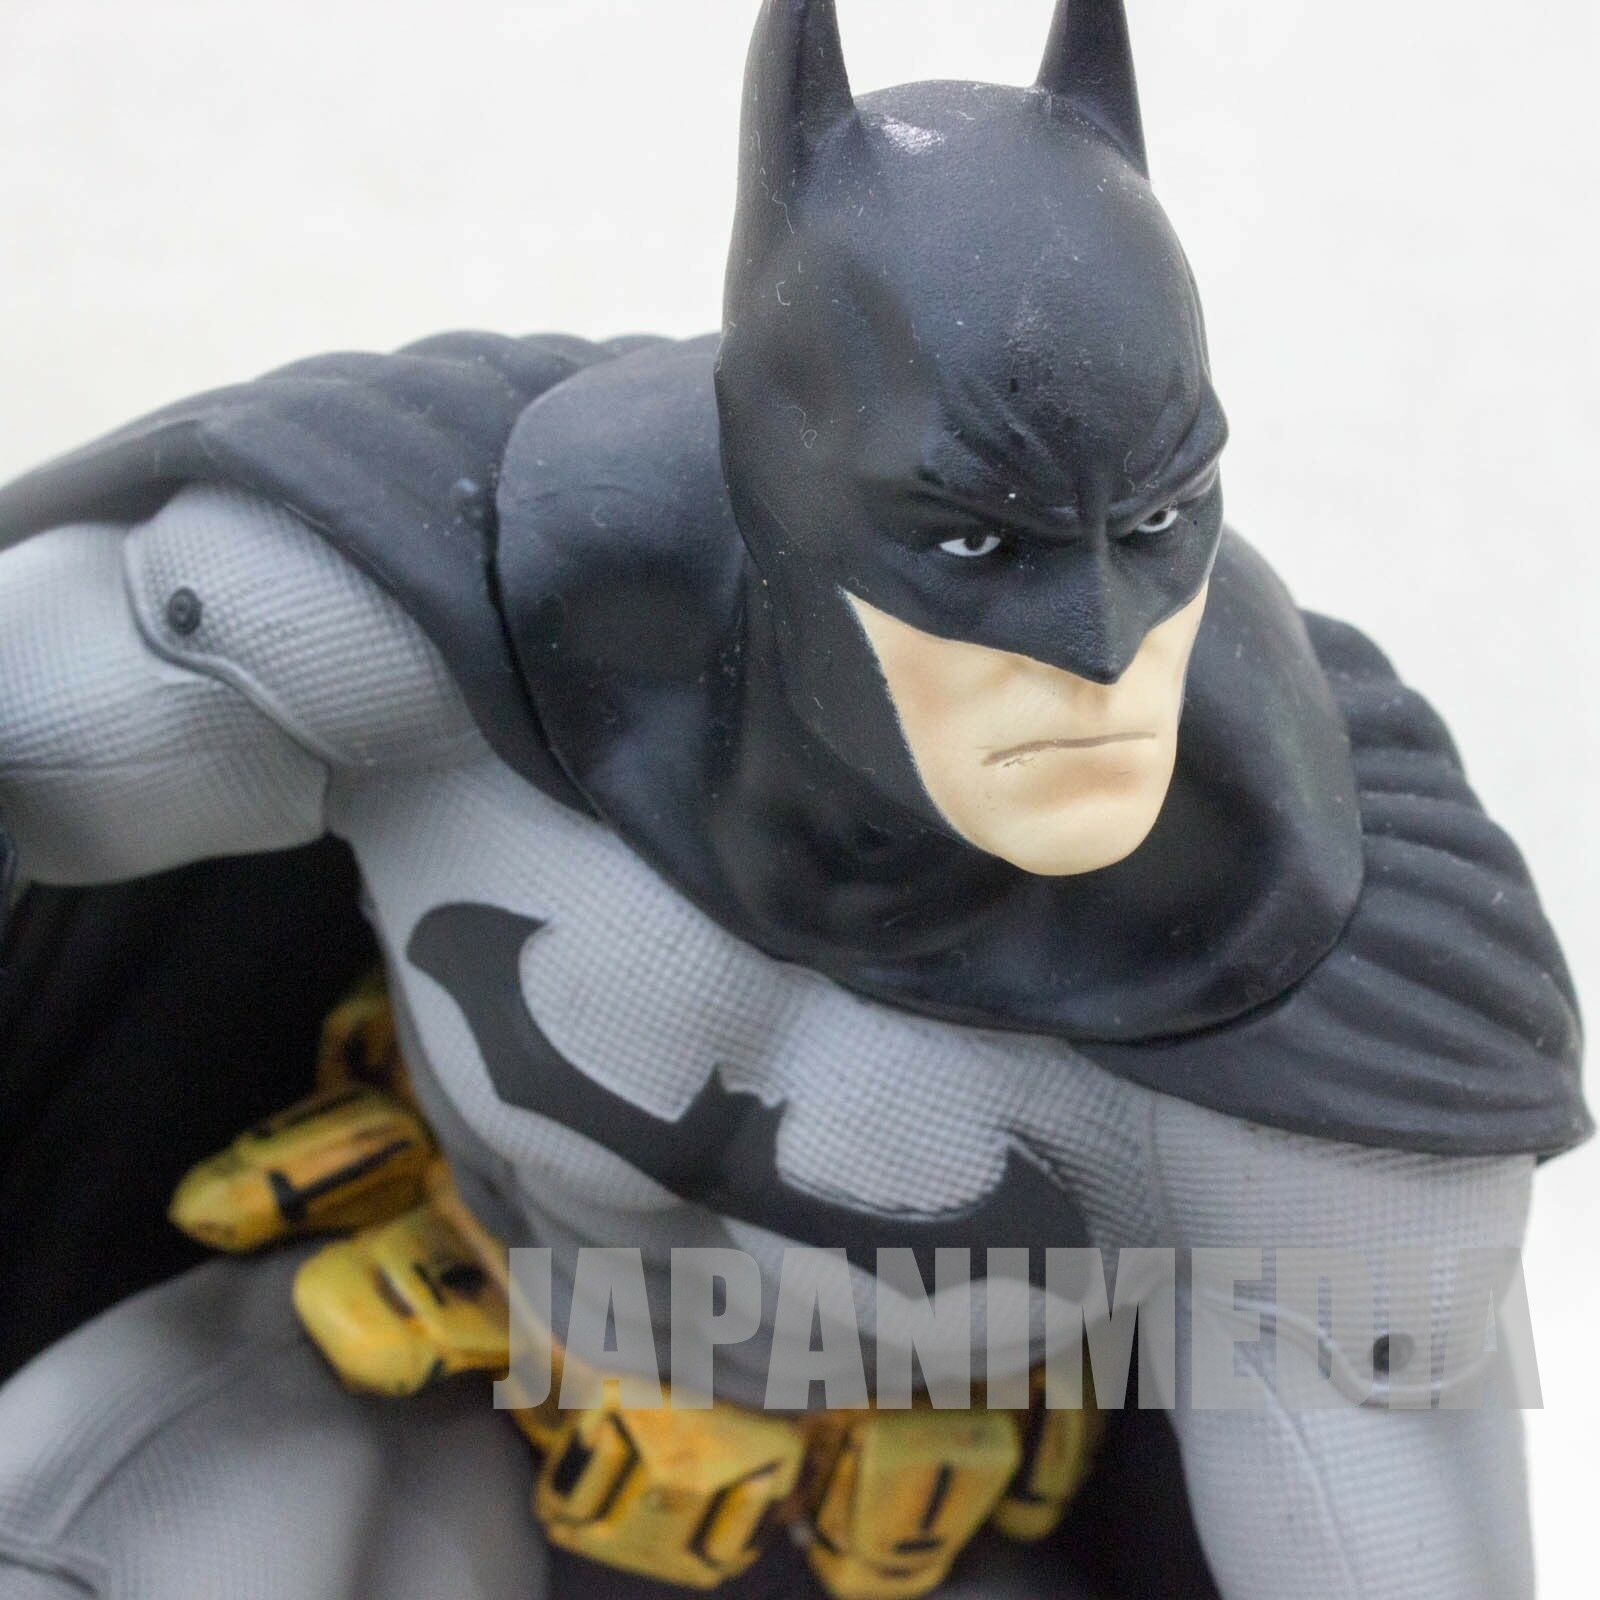 BATMAN Figure Kotobukiya Arkham City Collector's Edition Playstation 3 PS3